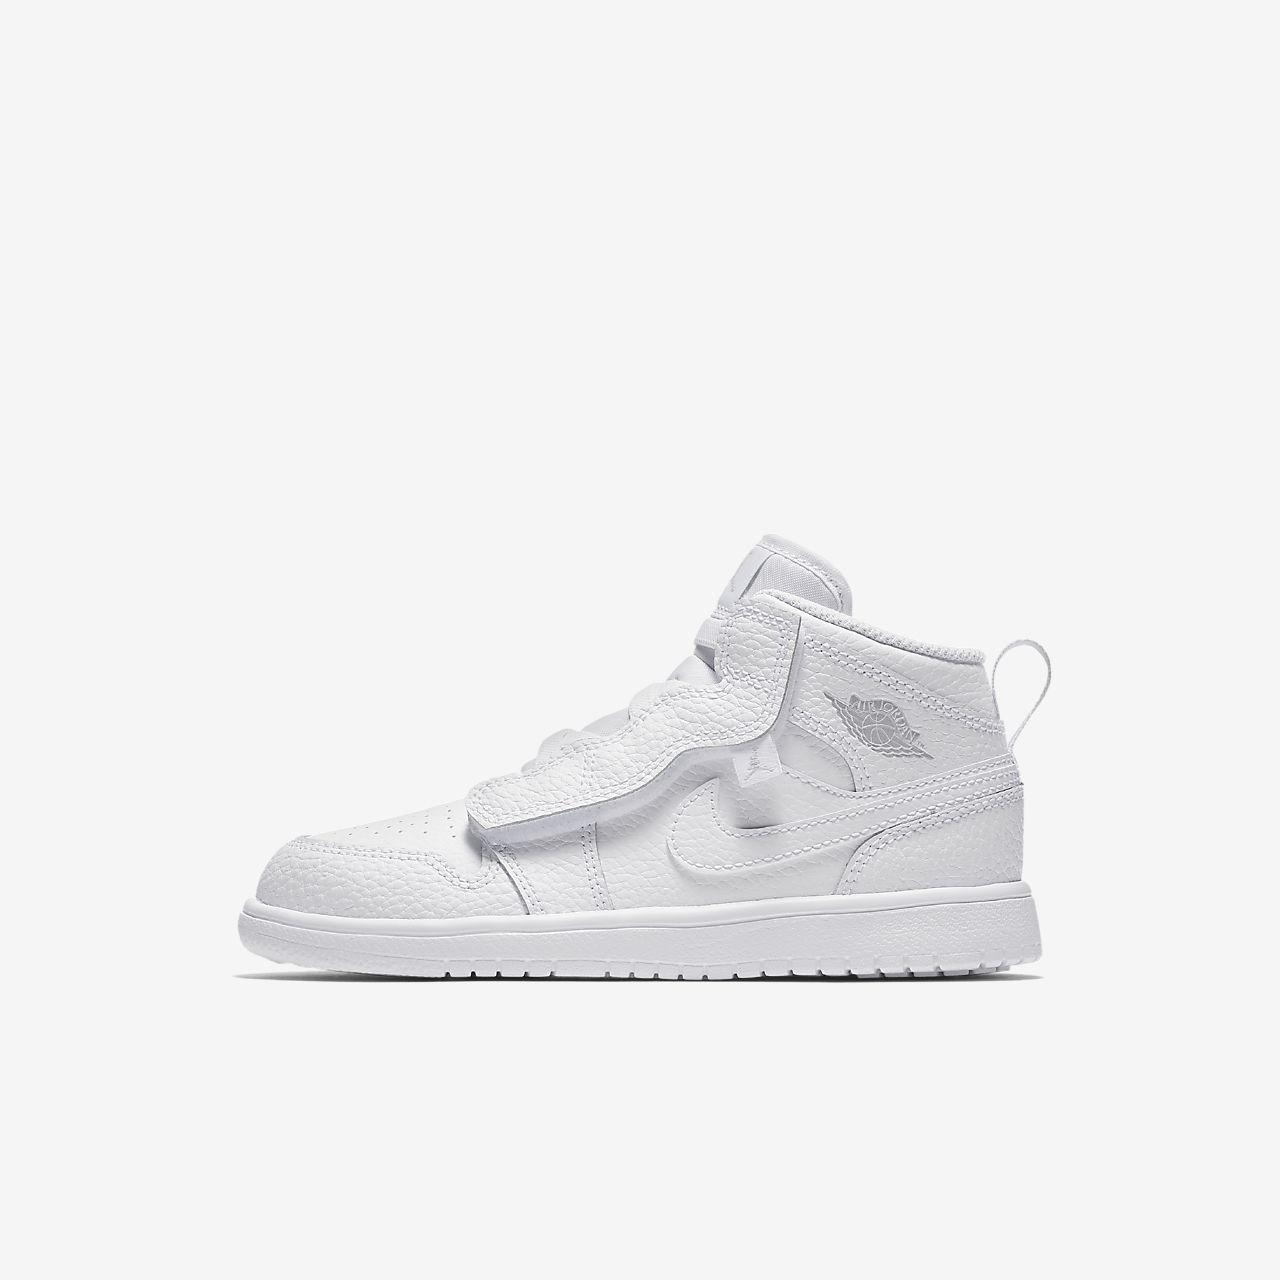 d13df5d92ce Calzado para niños talla pequeña Air Jordan 1 Mid Alt. Nike.com MX